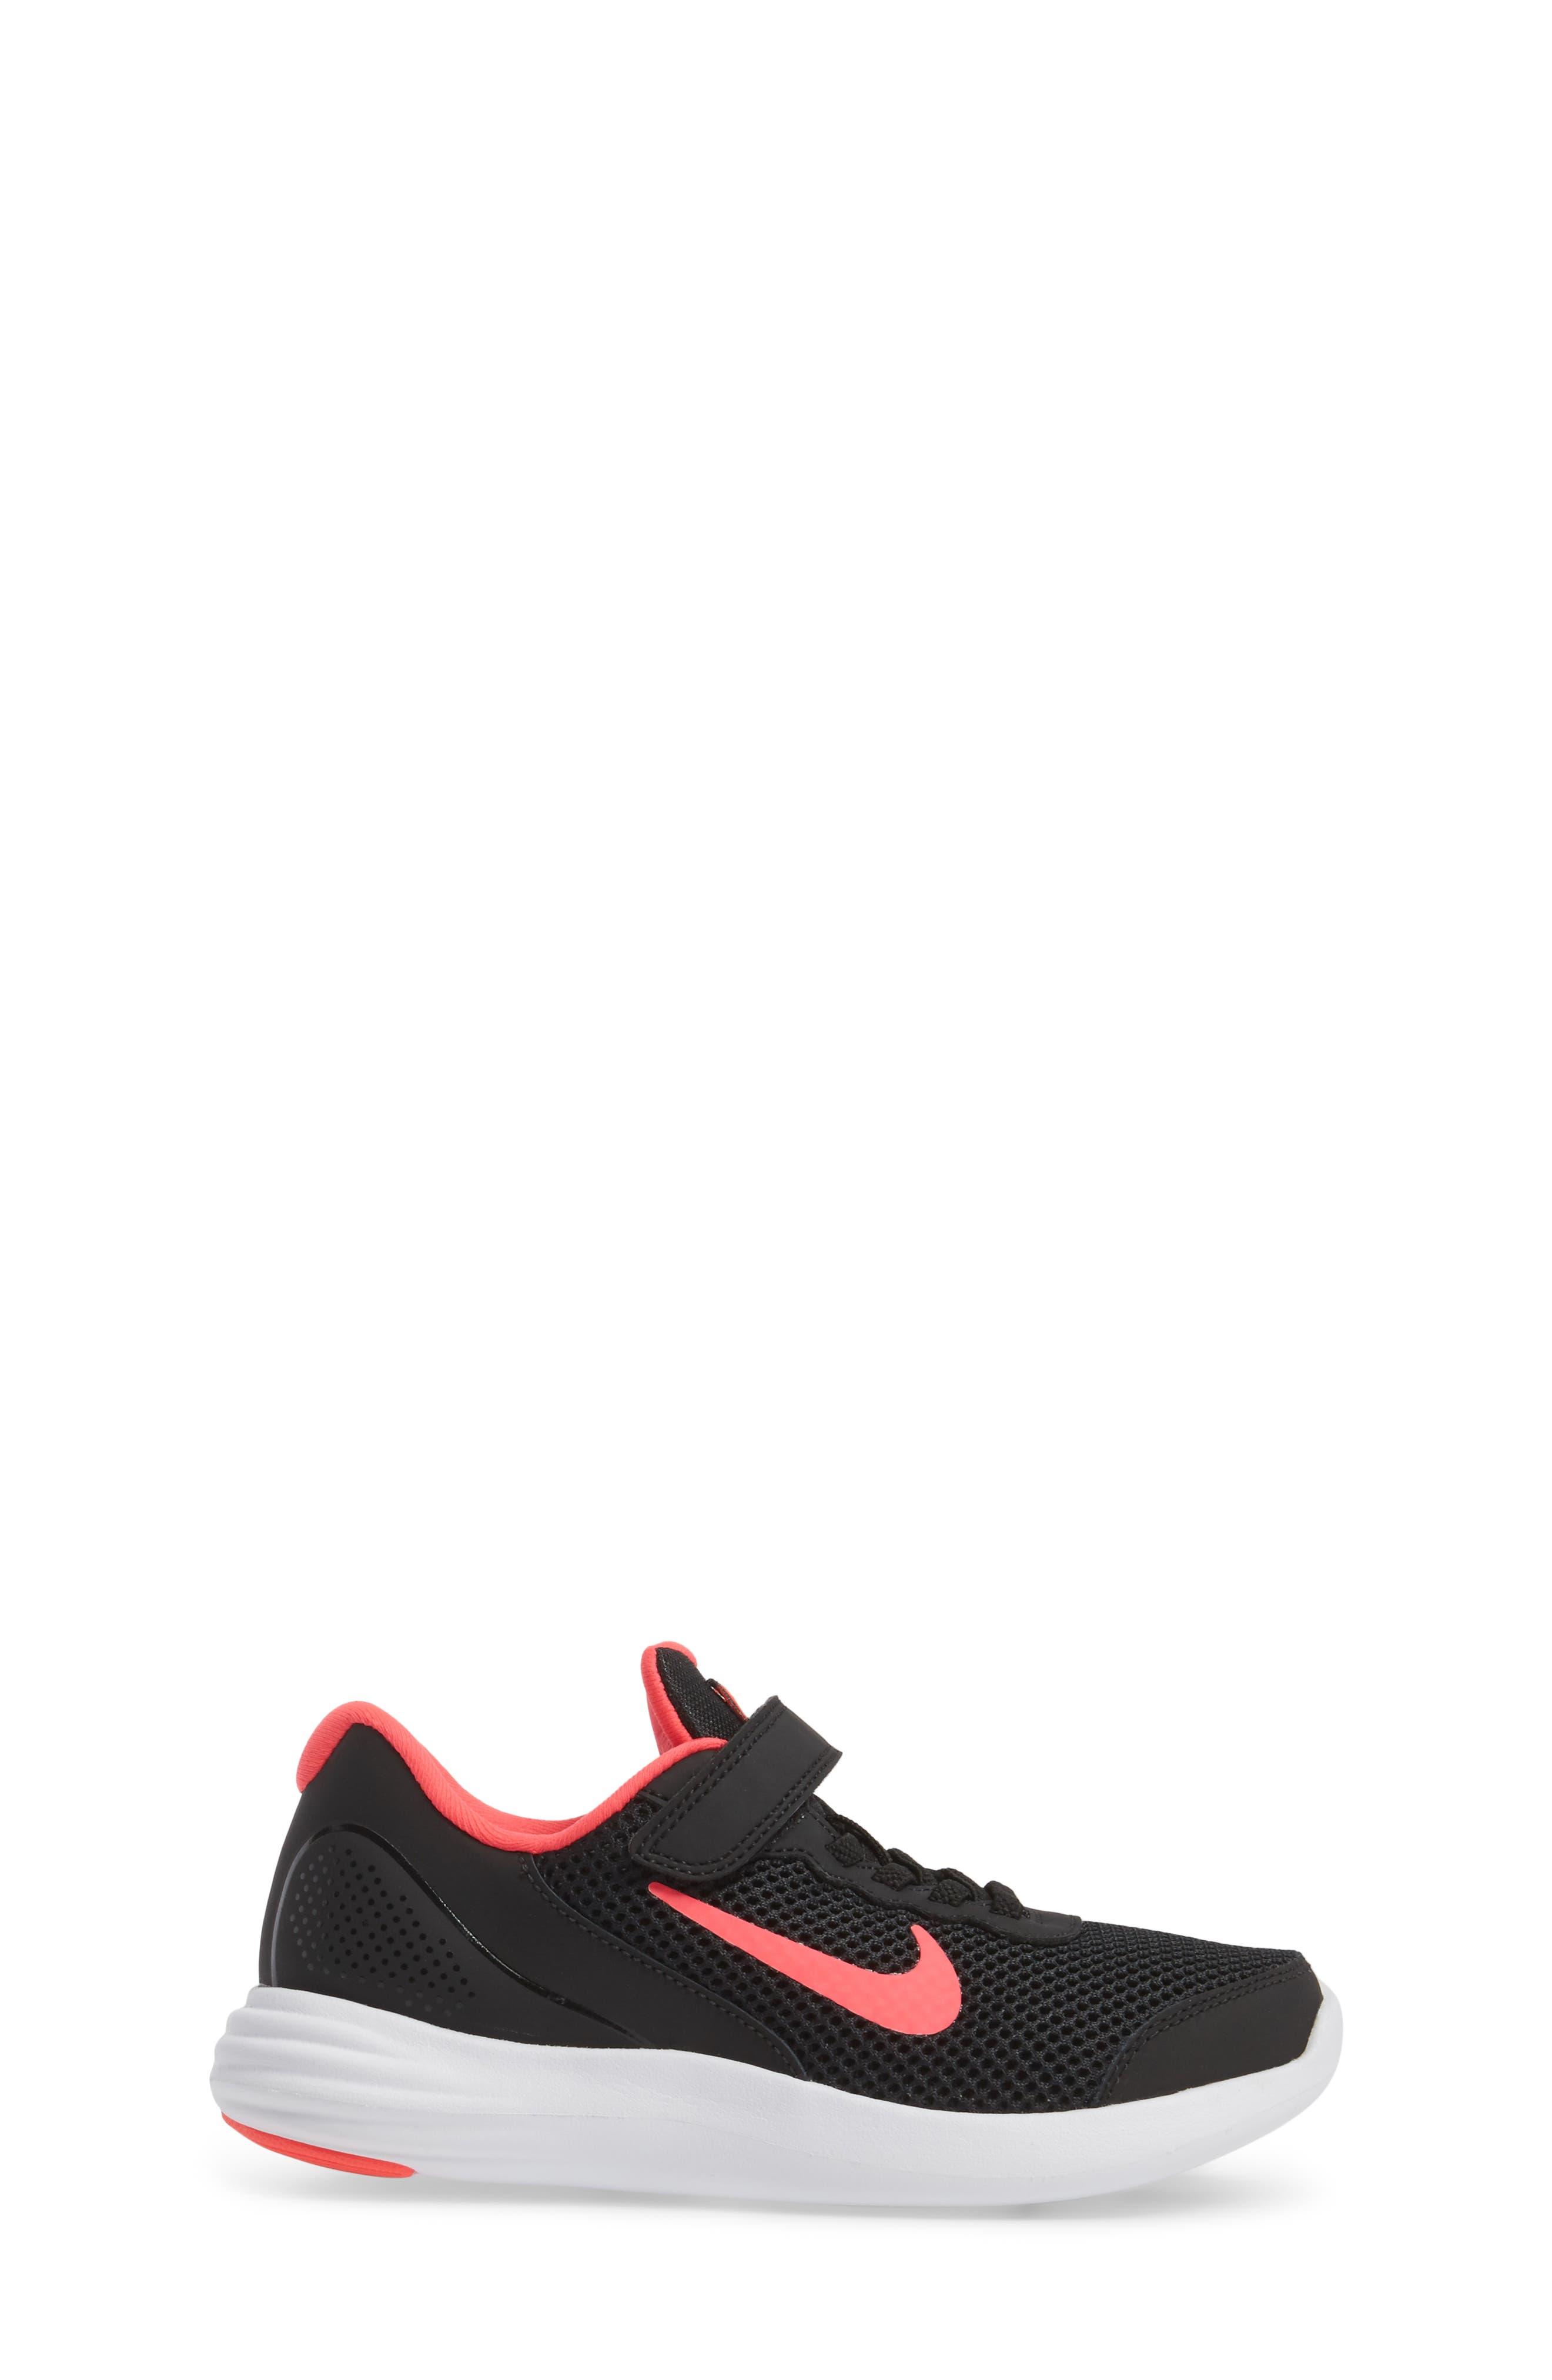 Lunar Apparent Sneaker,                             Alternate thumbnail 3, color,                             Black/ Racer Pink/ White